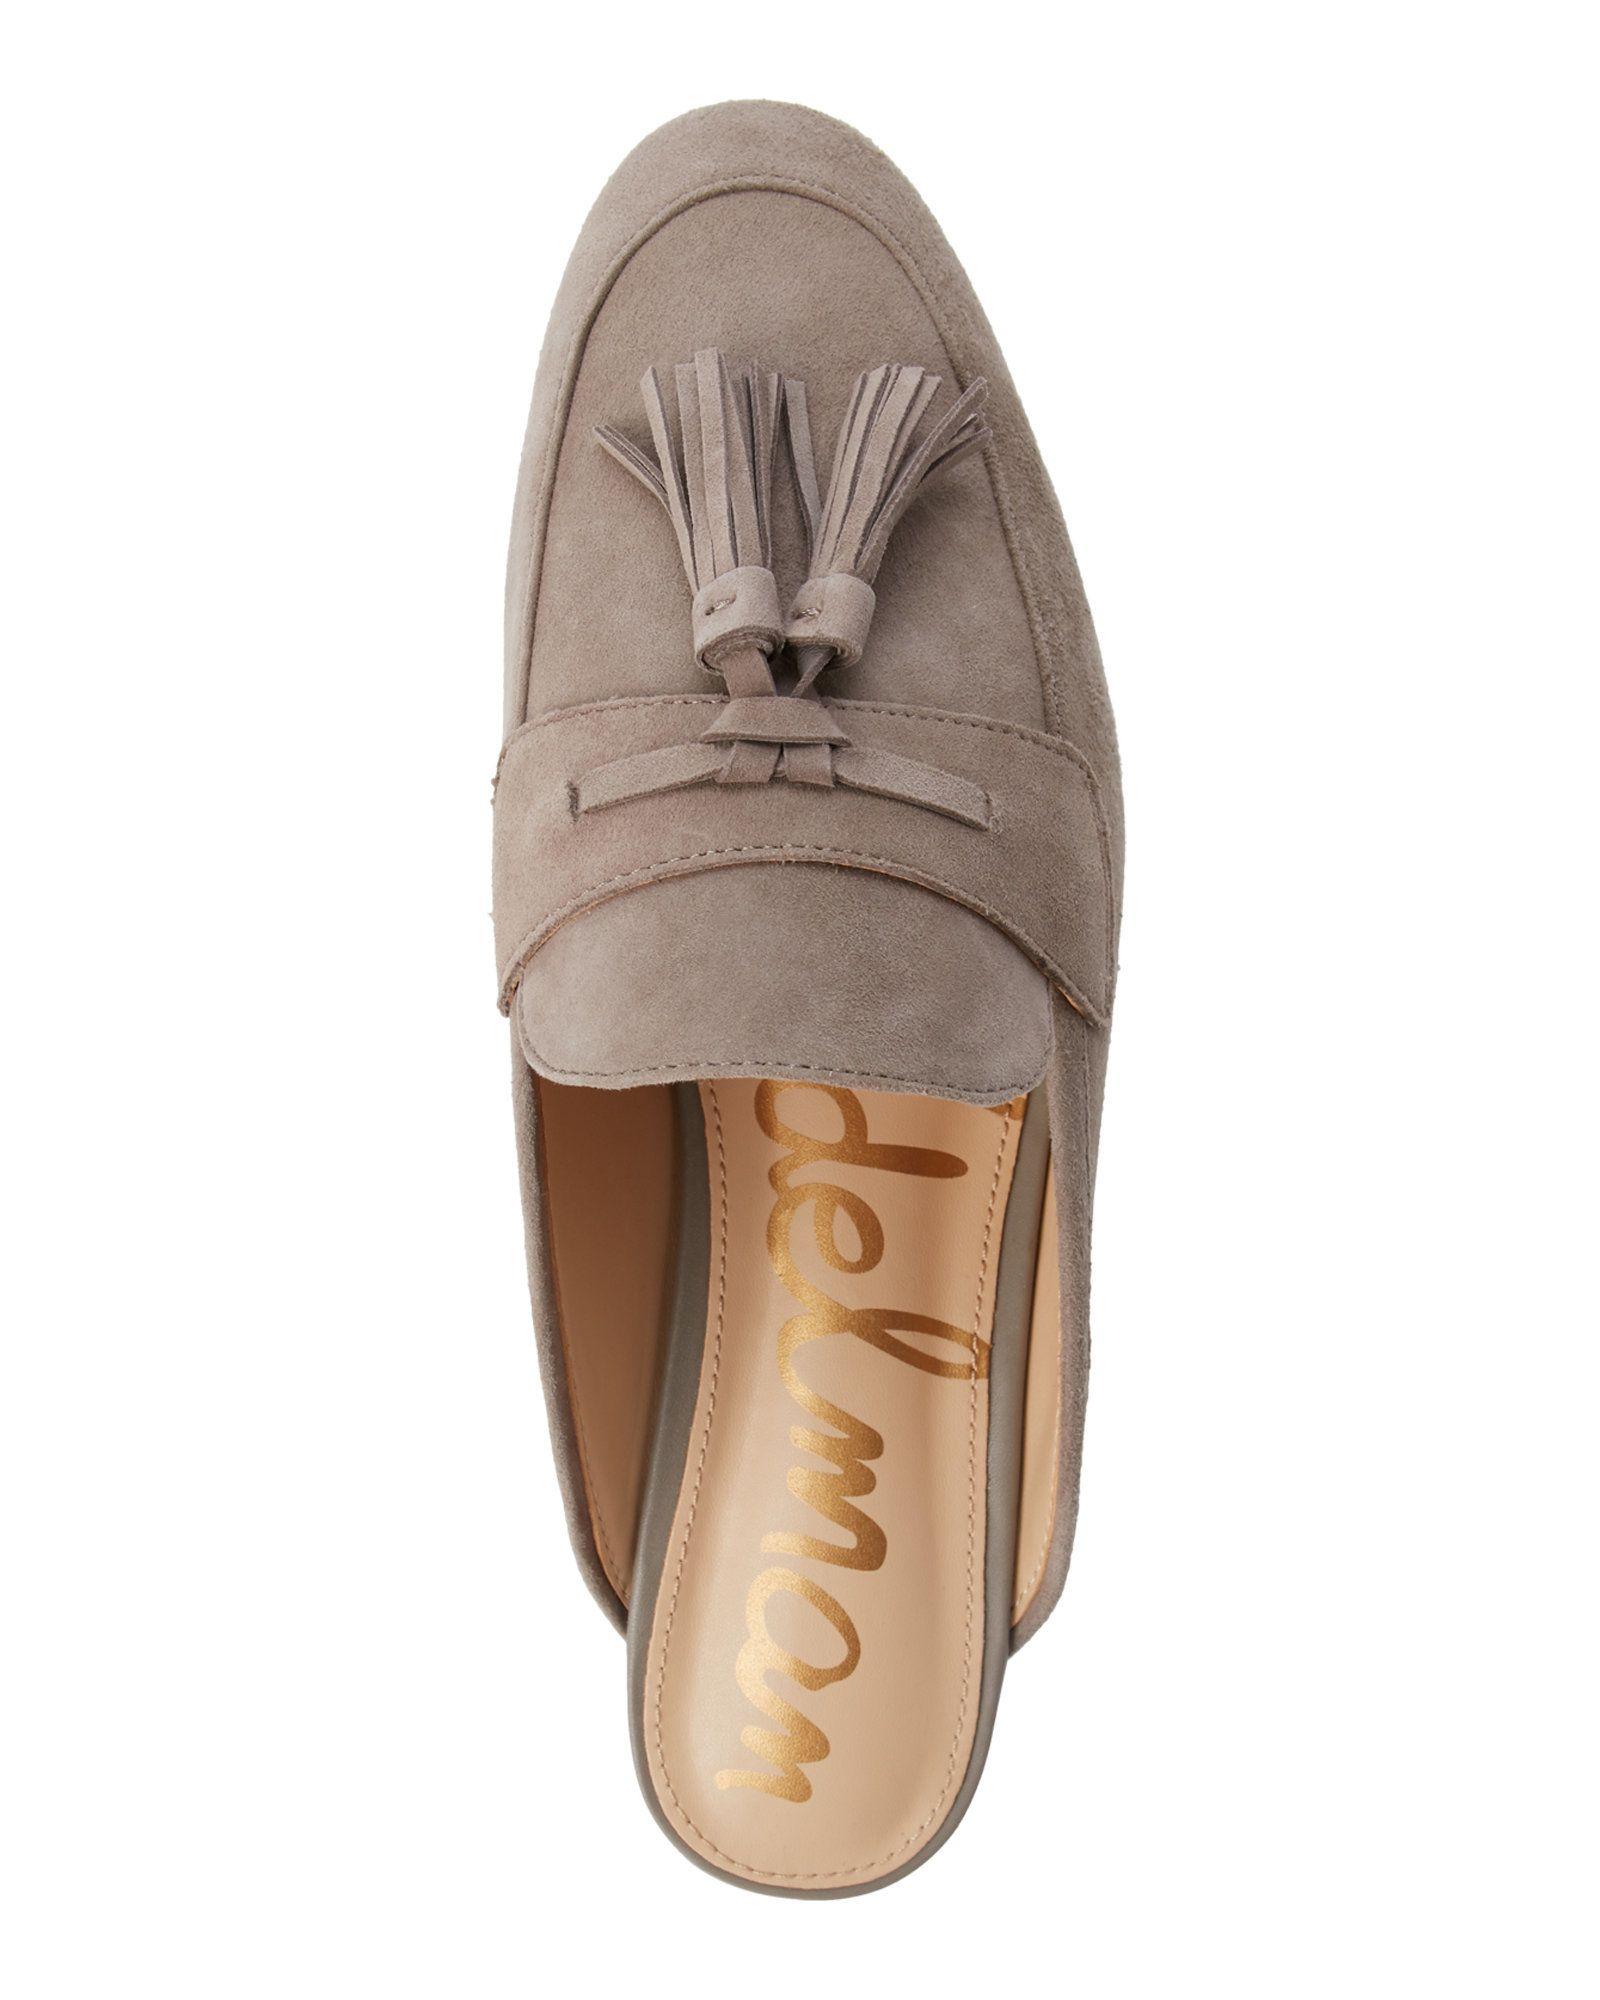 6604e288a890c1 Century 21 - sam edelman Putty Paris Suede Tasseled Loafer Mules ...